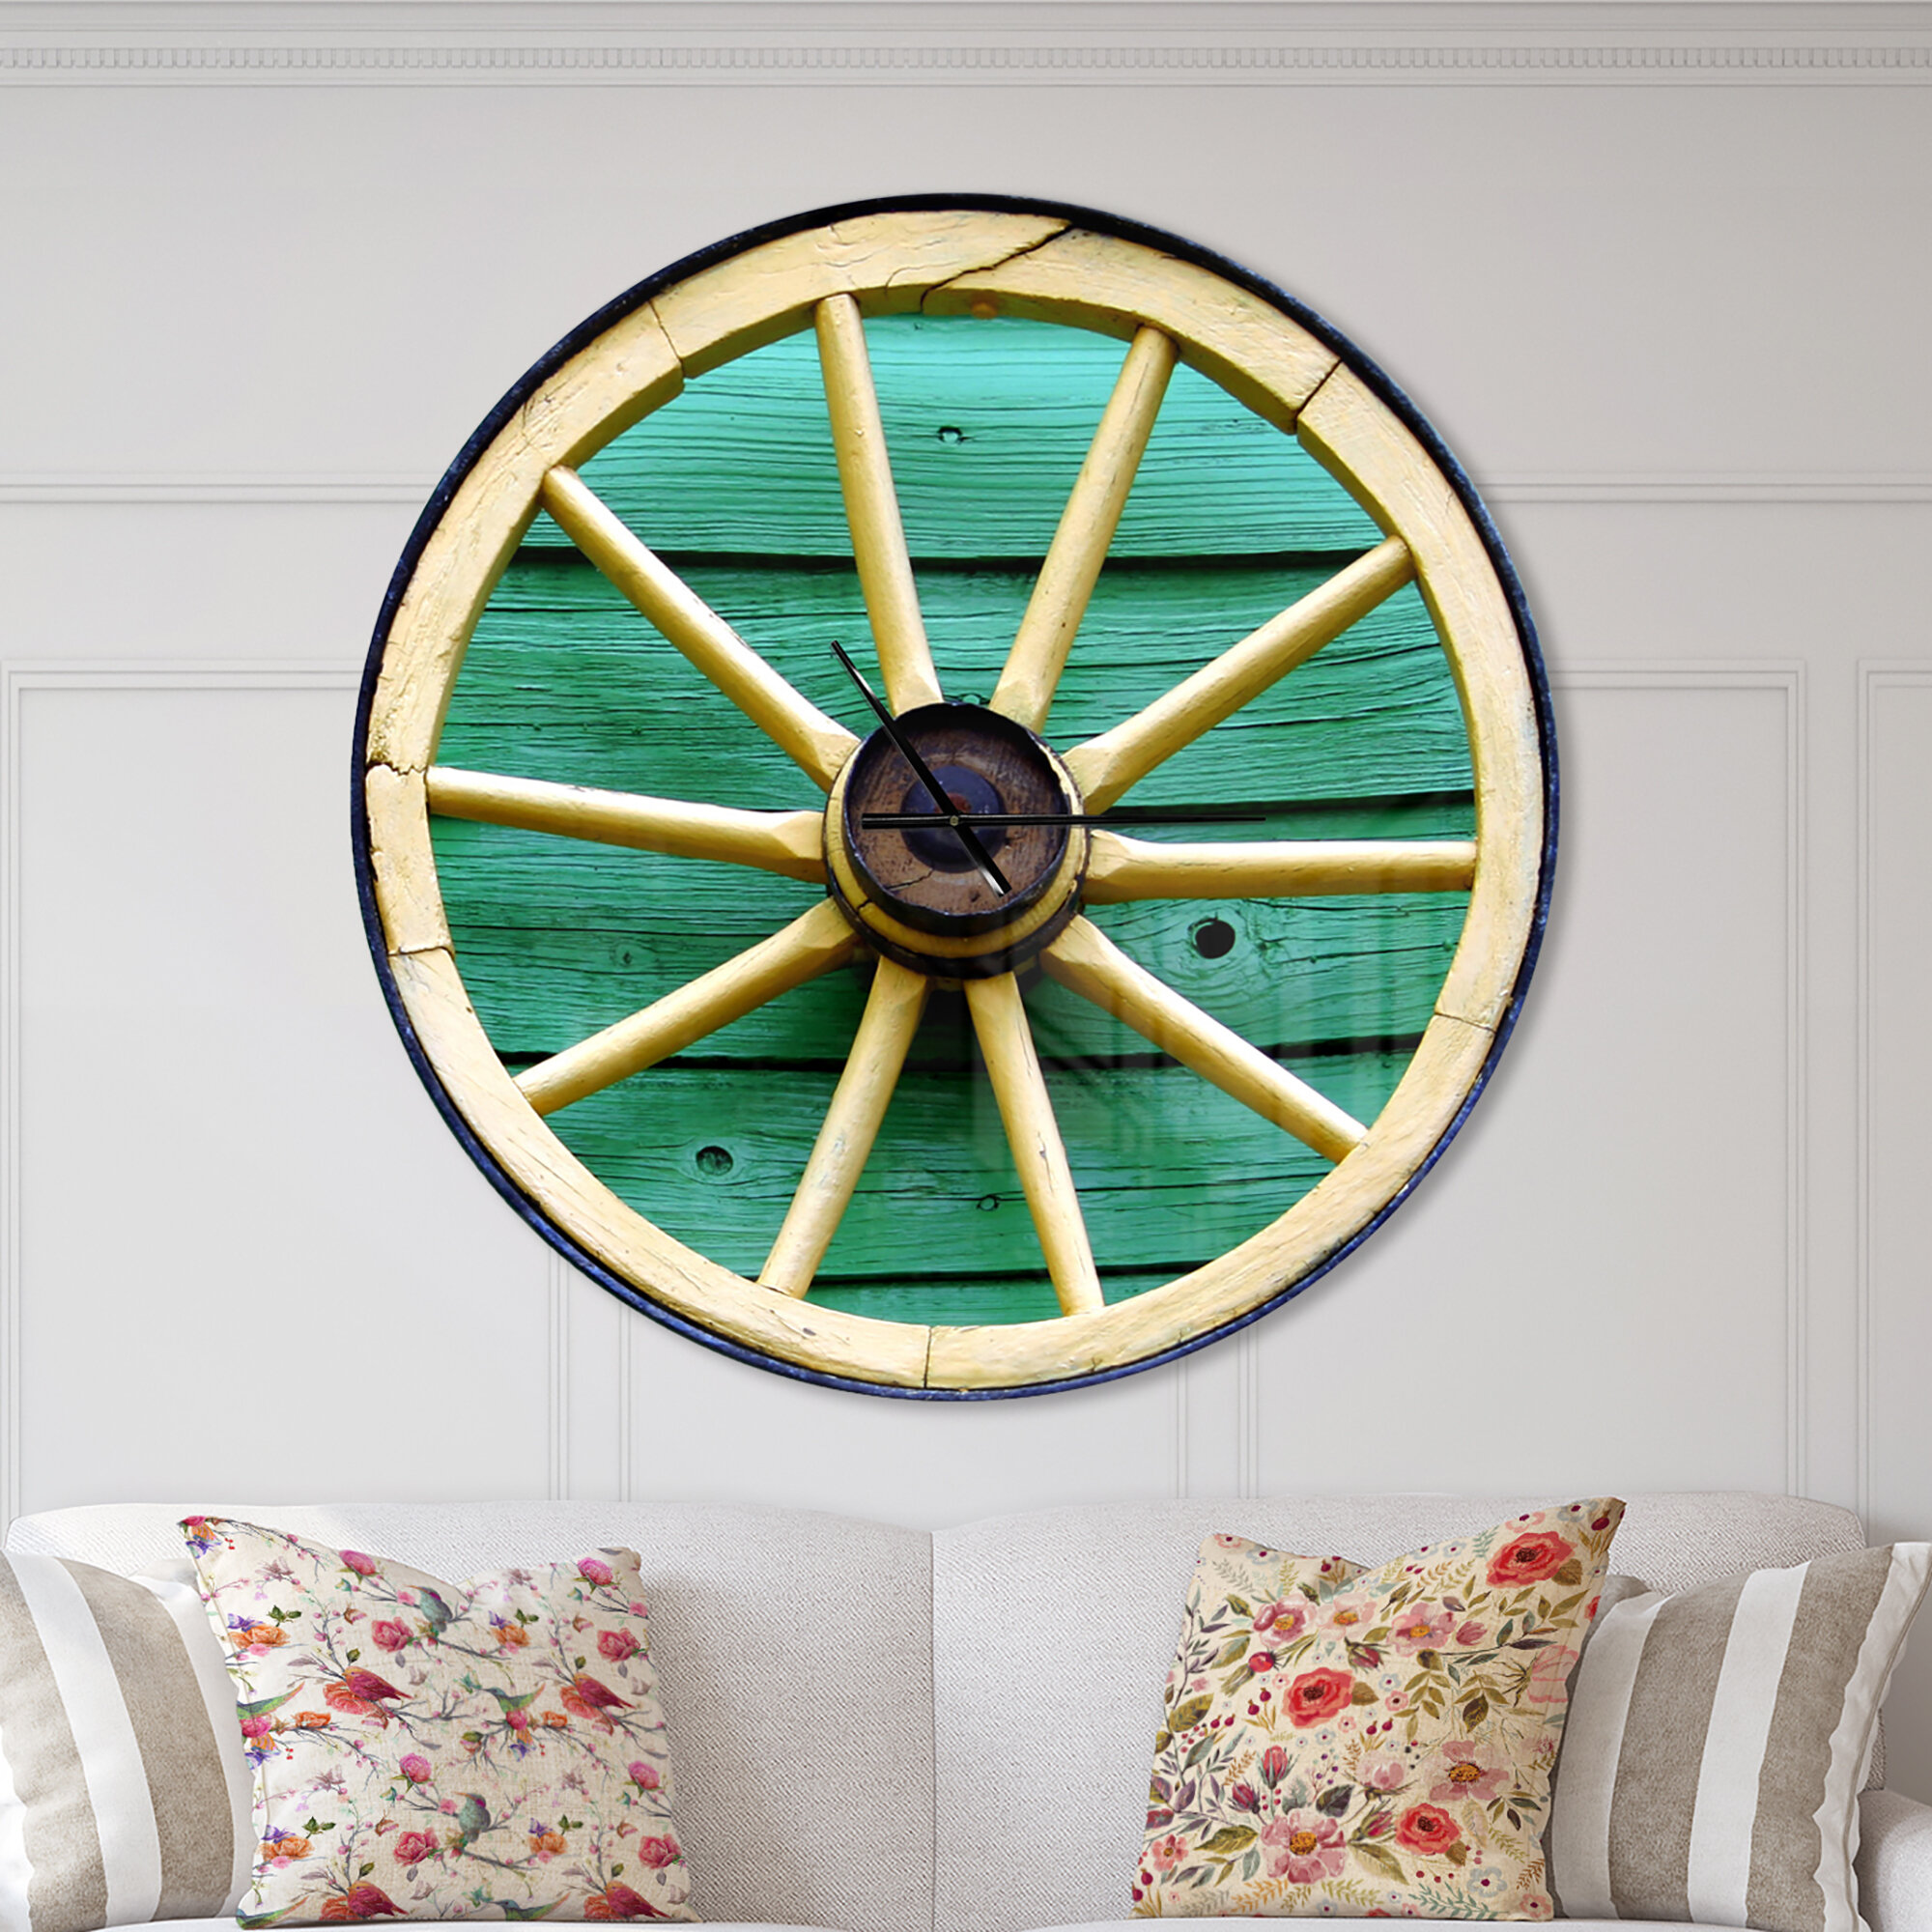 East Urban Home Farmhouse Designart Antique Wagon Wheel On Wood Wall Clock Wayfair